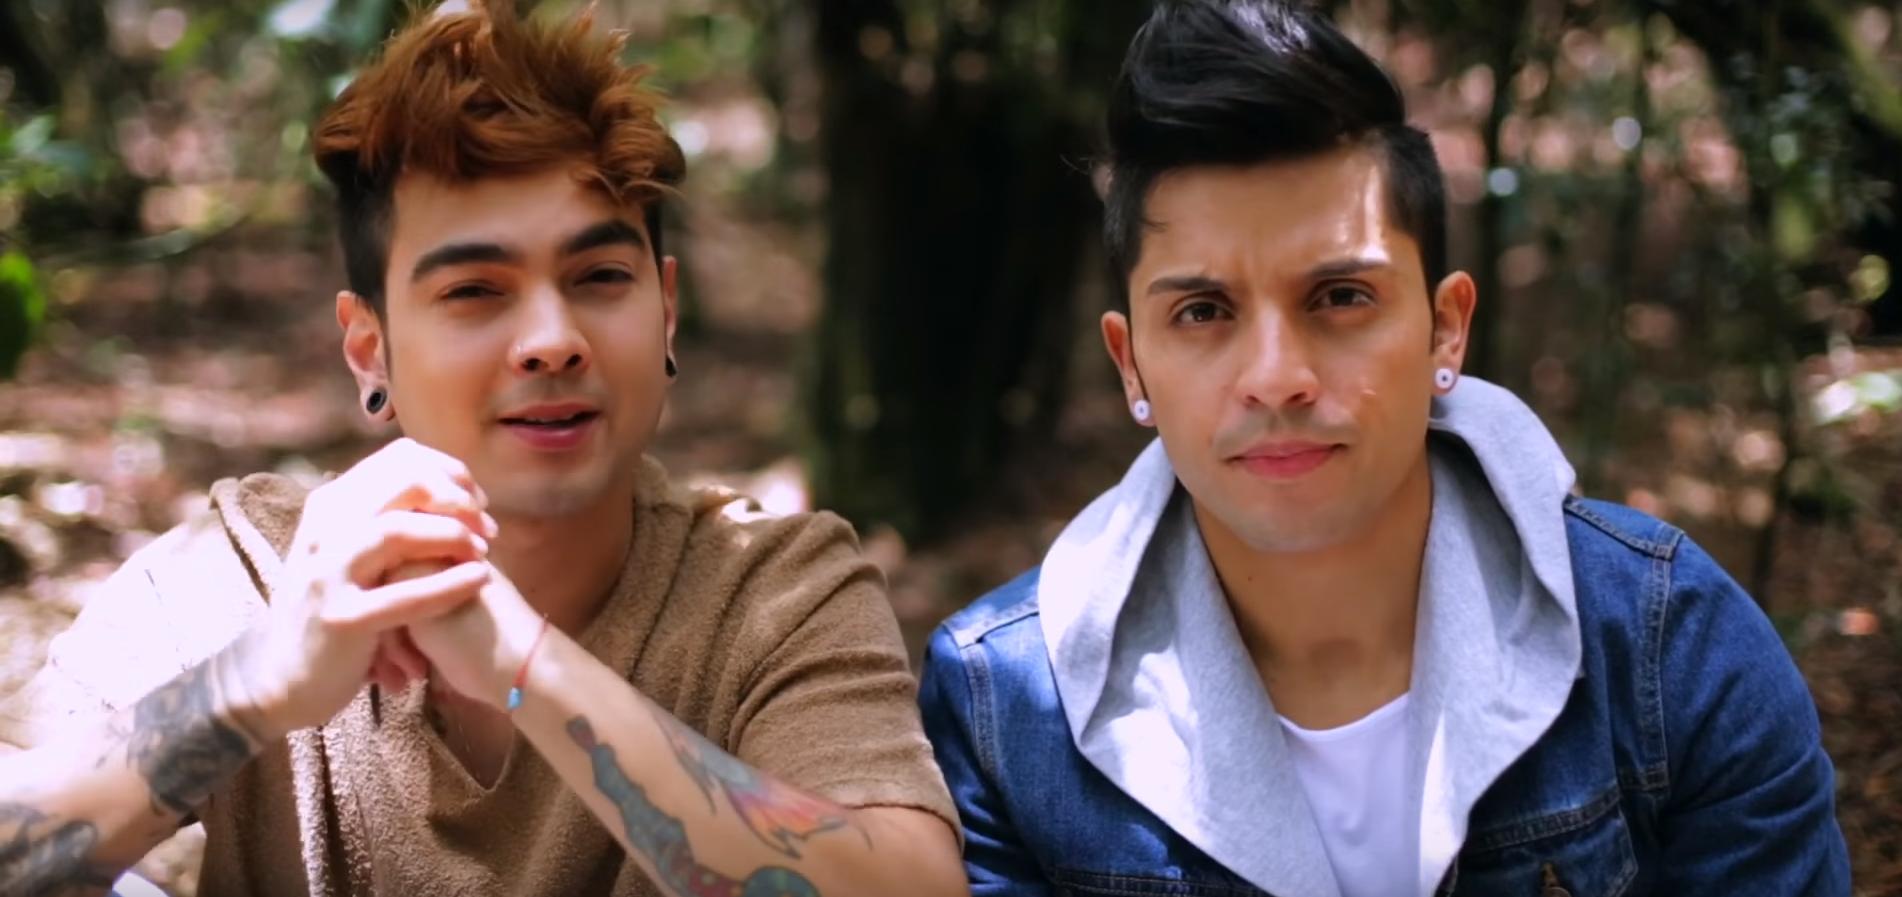 Con firmas, 'Youtubers' piden espacios libres de discriminación